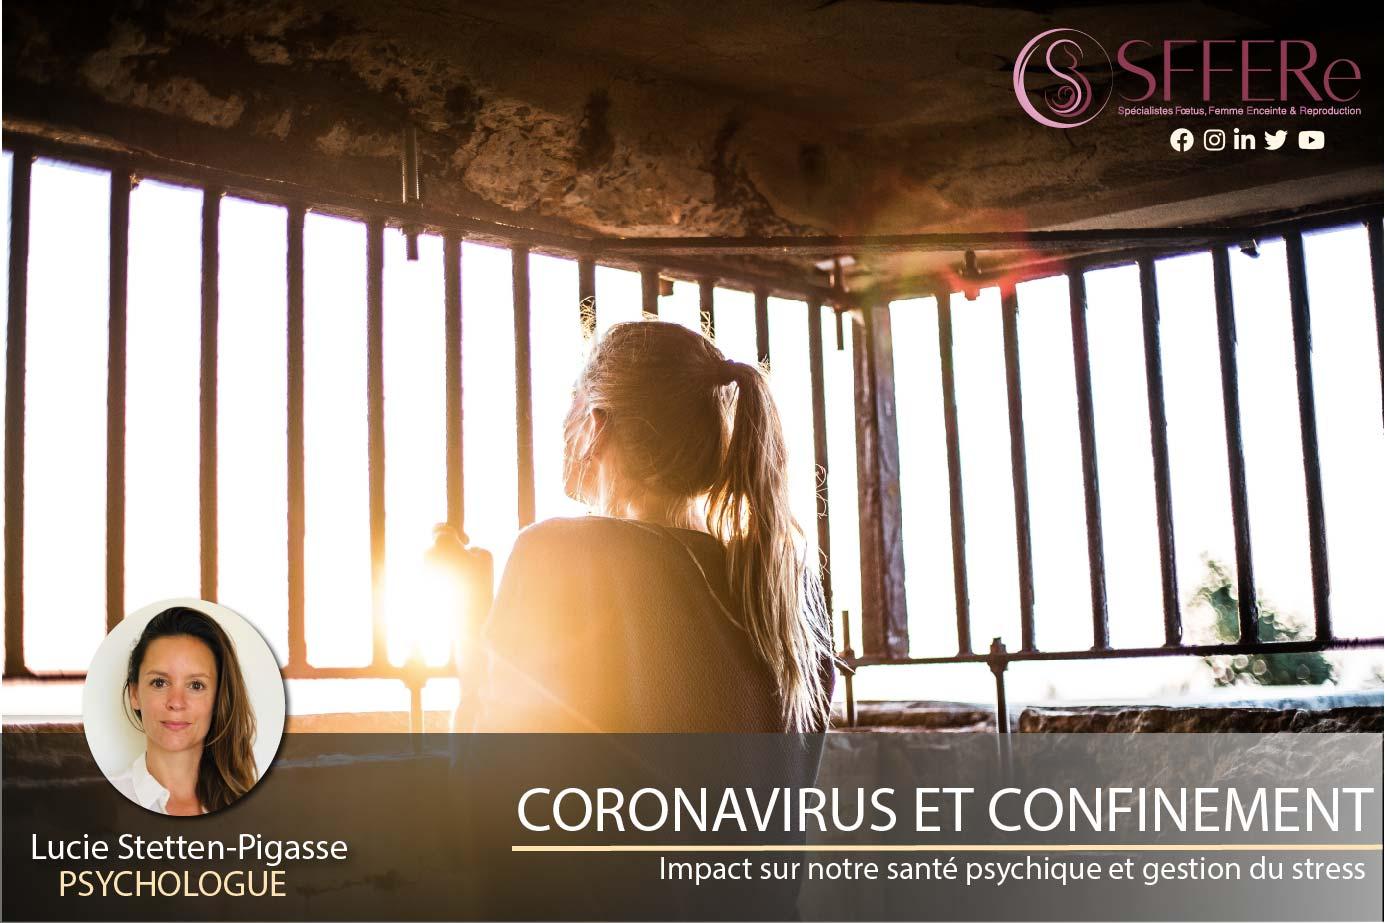 CORONAVIRUS ET CONFINEMENT (Partie 1)